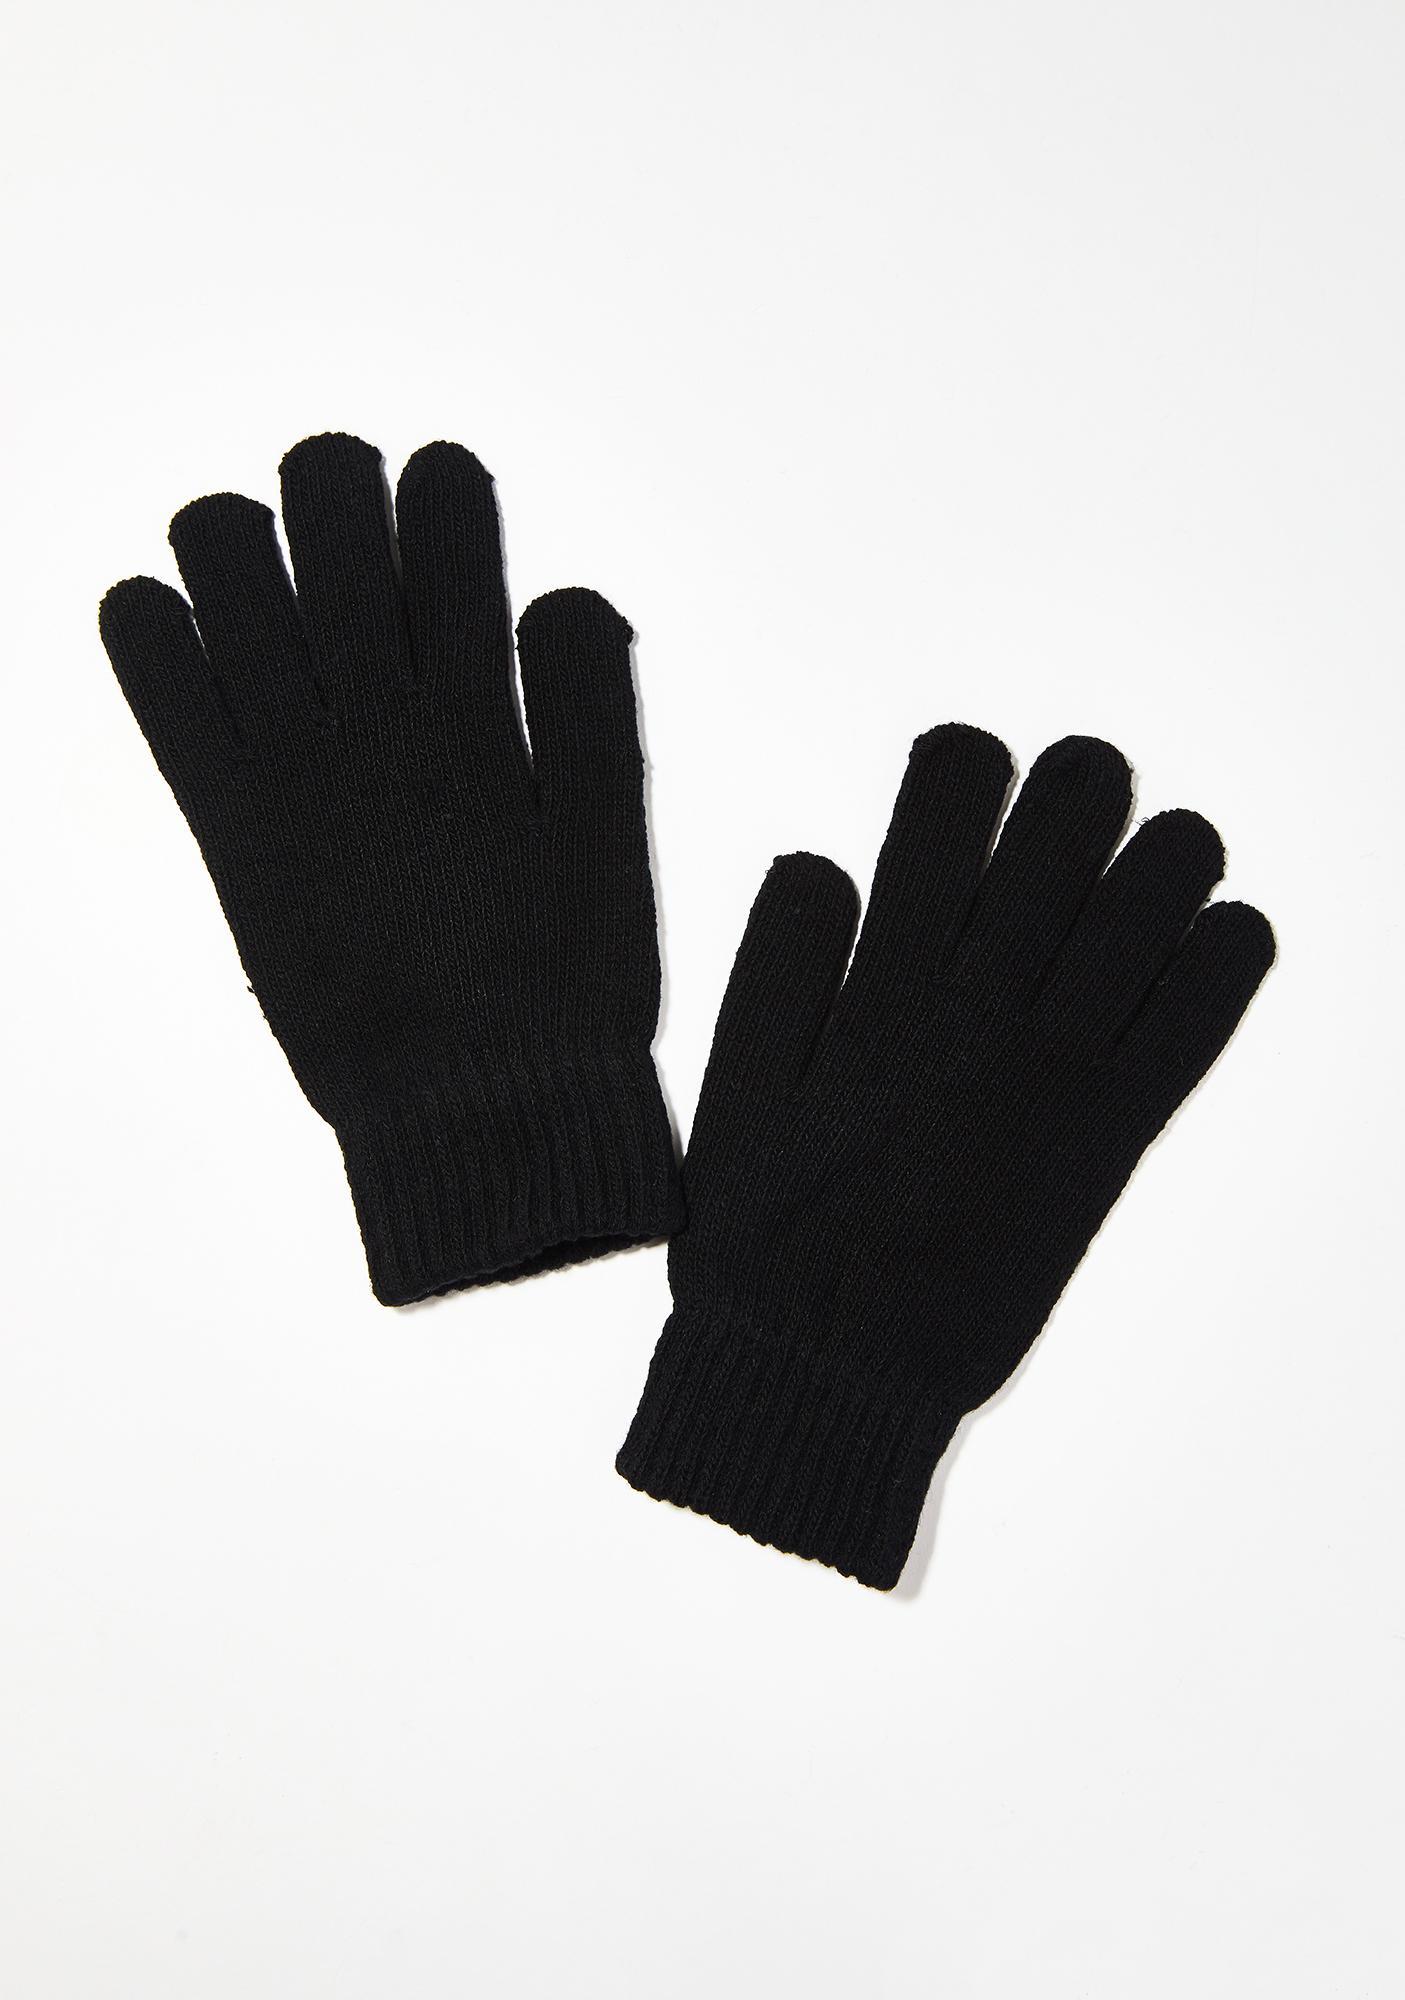 Don't Be Basic Knit Gloves